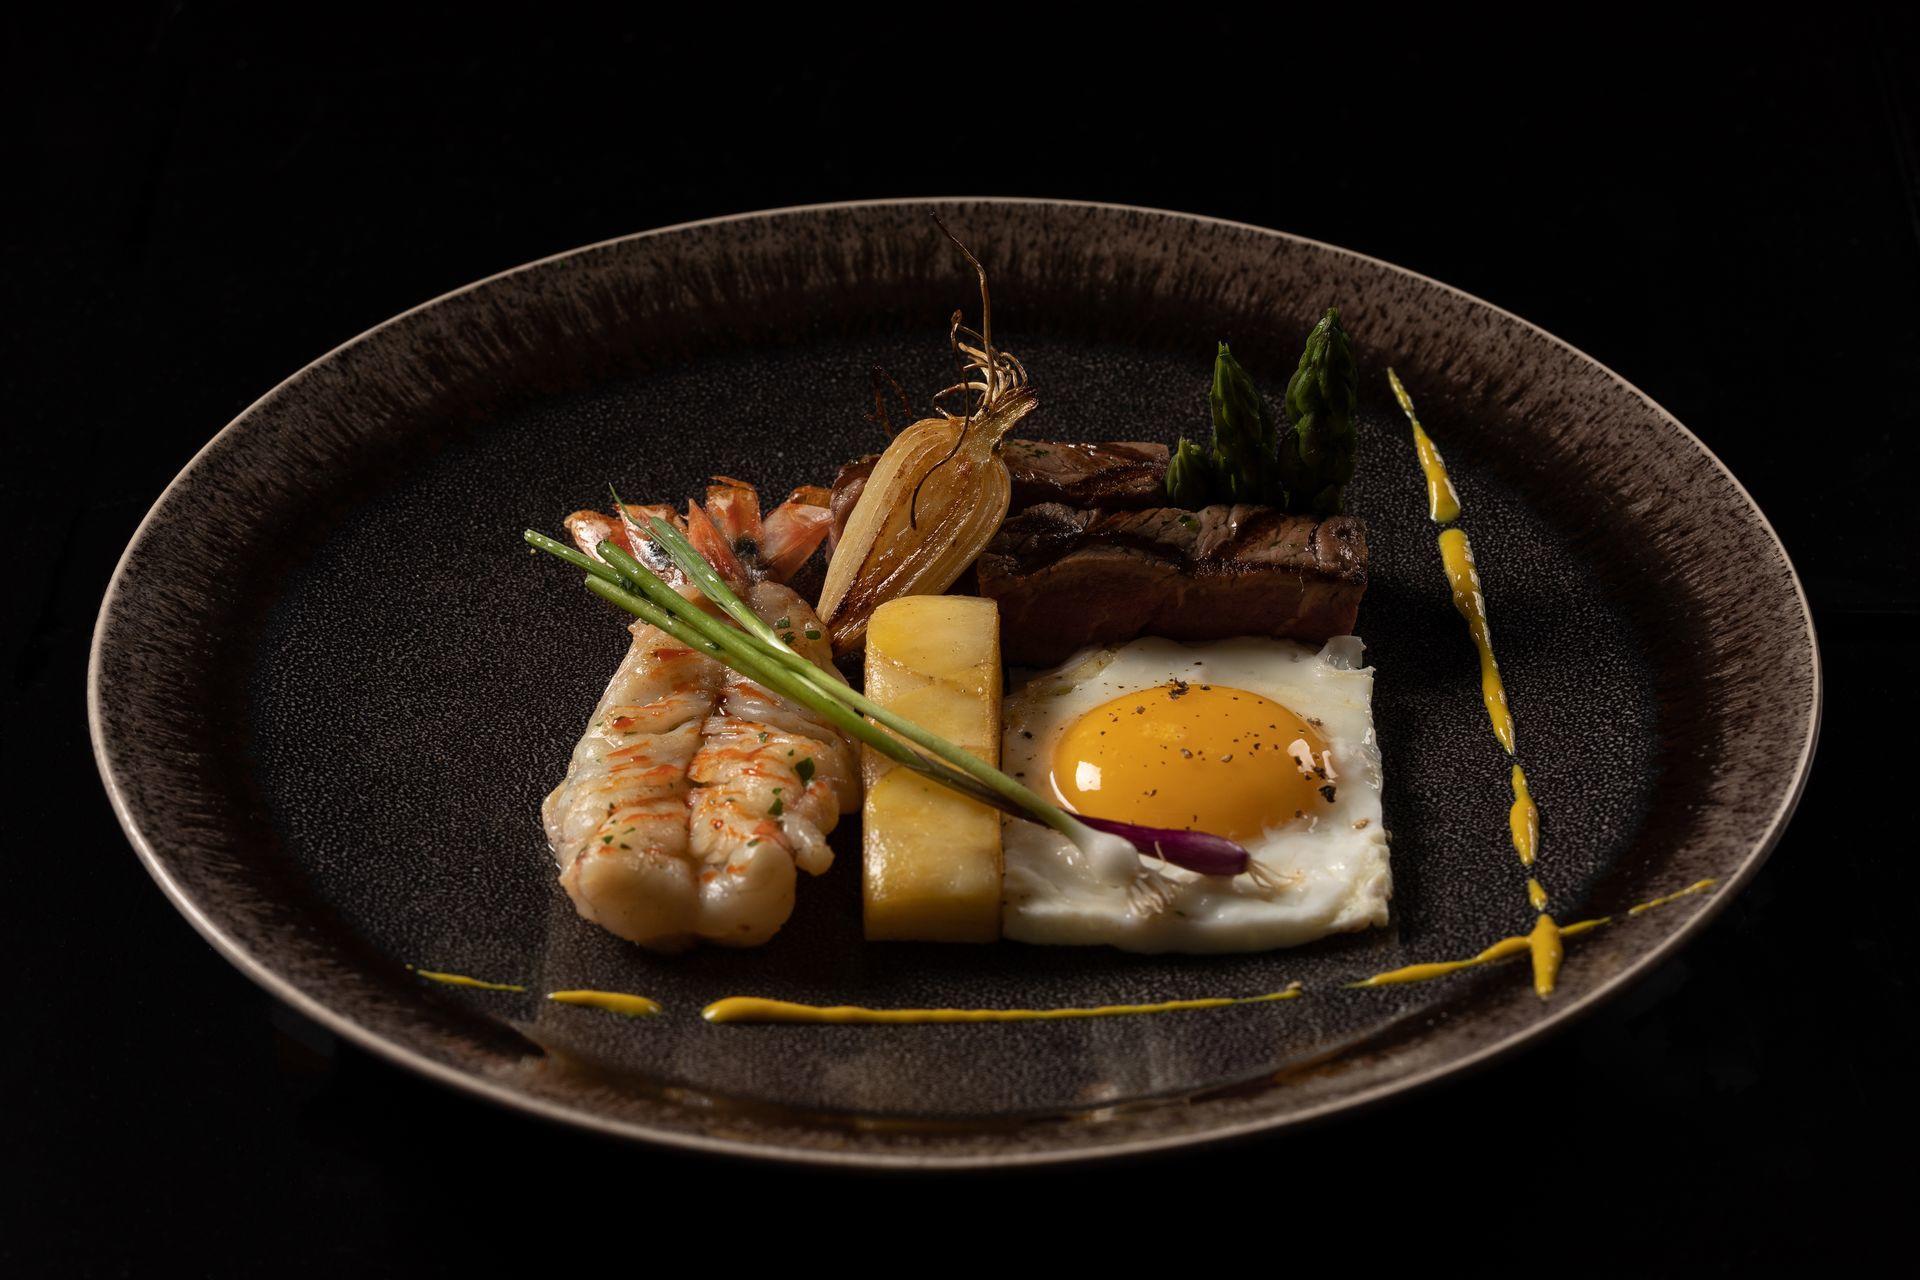 shrimp, steak, and egg dish